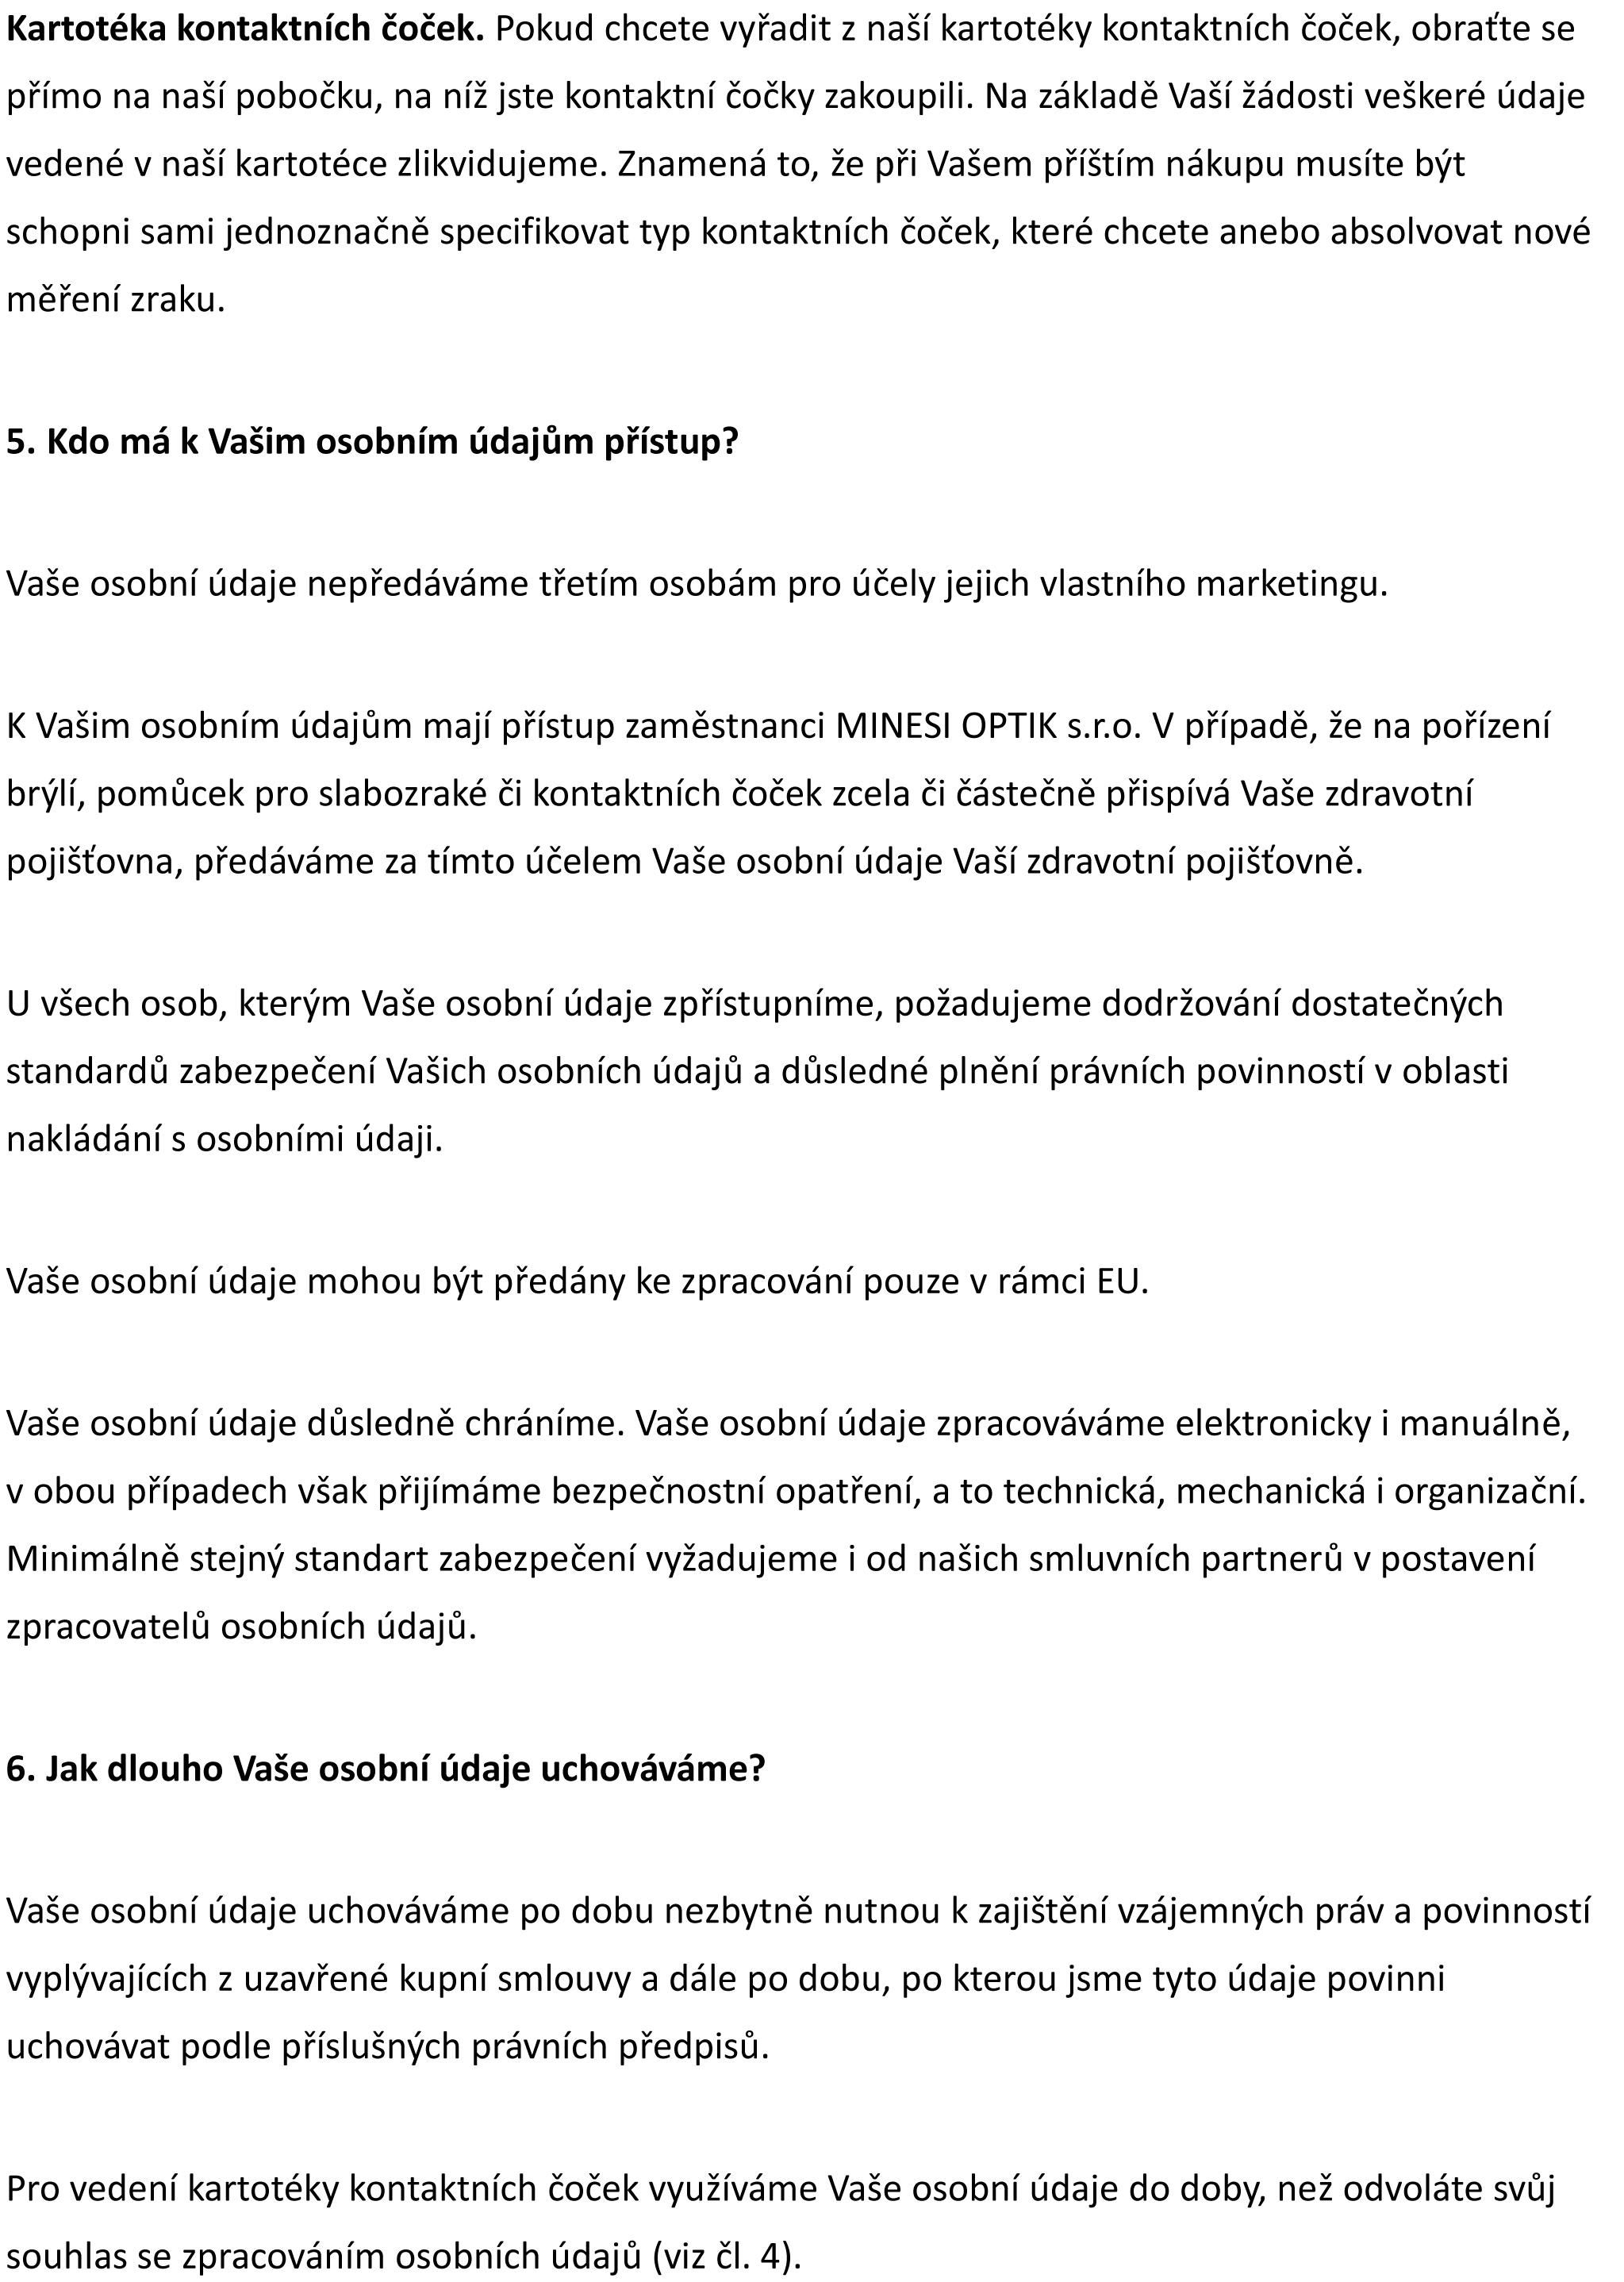 GDPR3.jpg